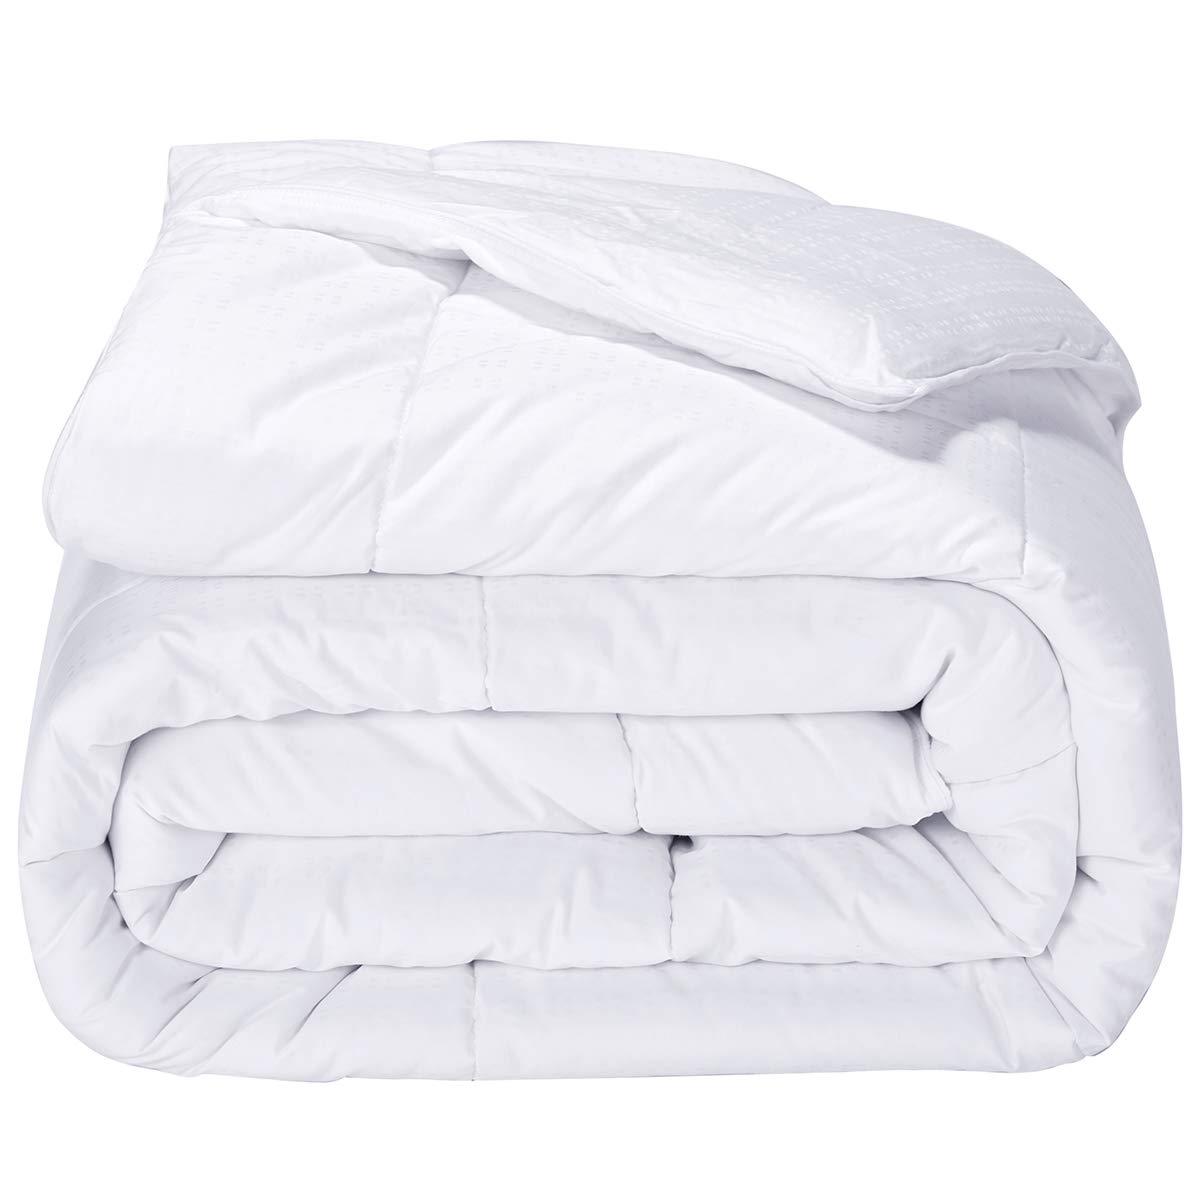 Puredown Alternative Comforter White Duvet Insert XL Cotton Shell 300TC, Twin/Twin X-Large PD-AC15009-T